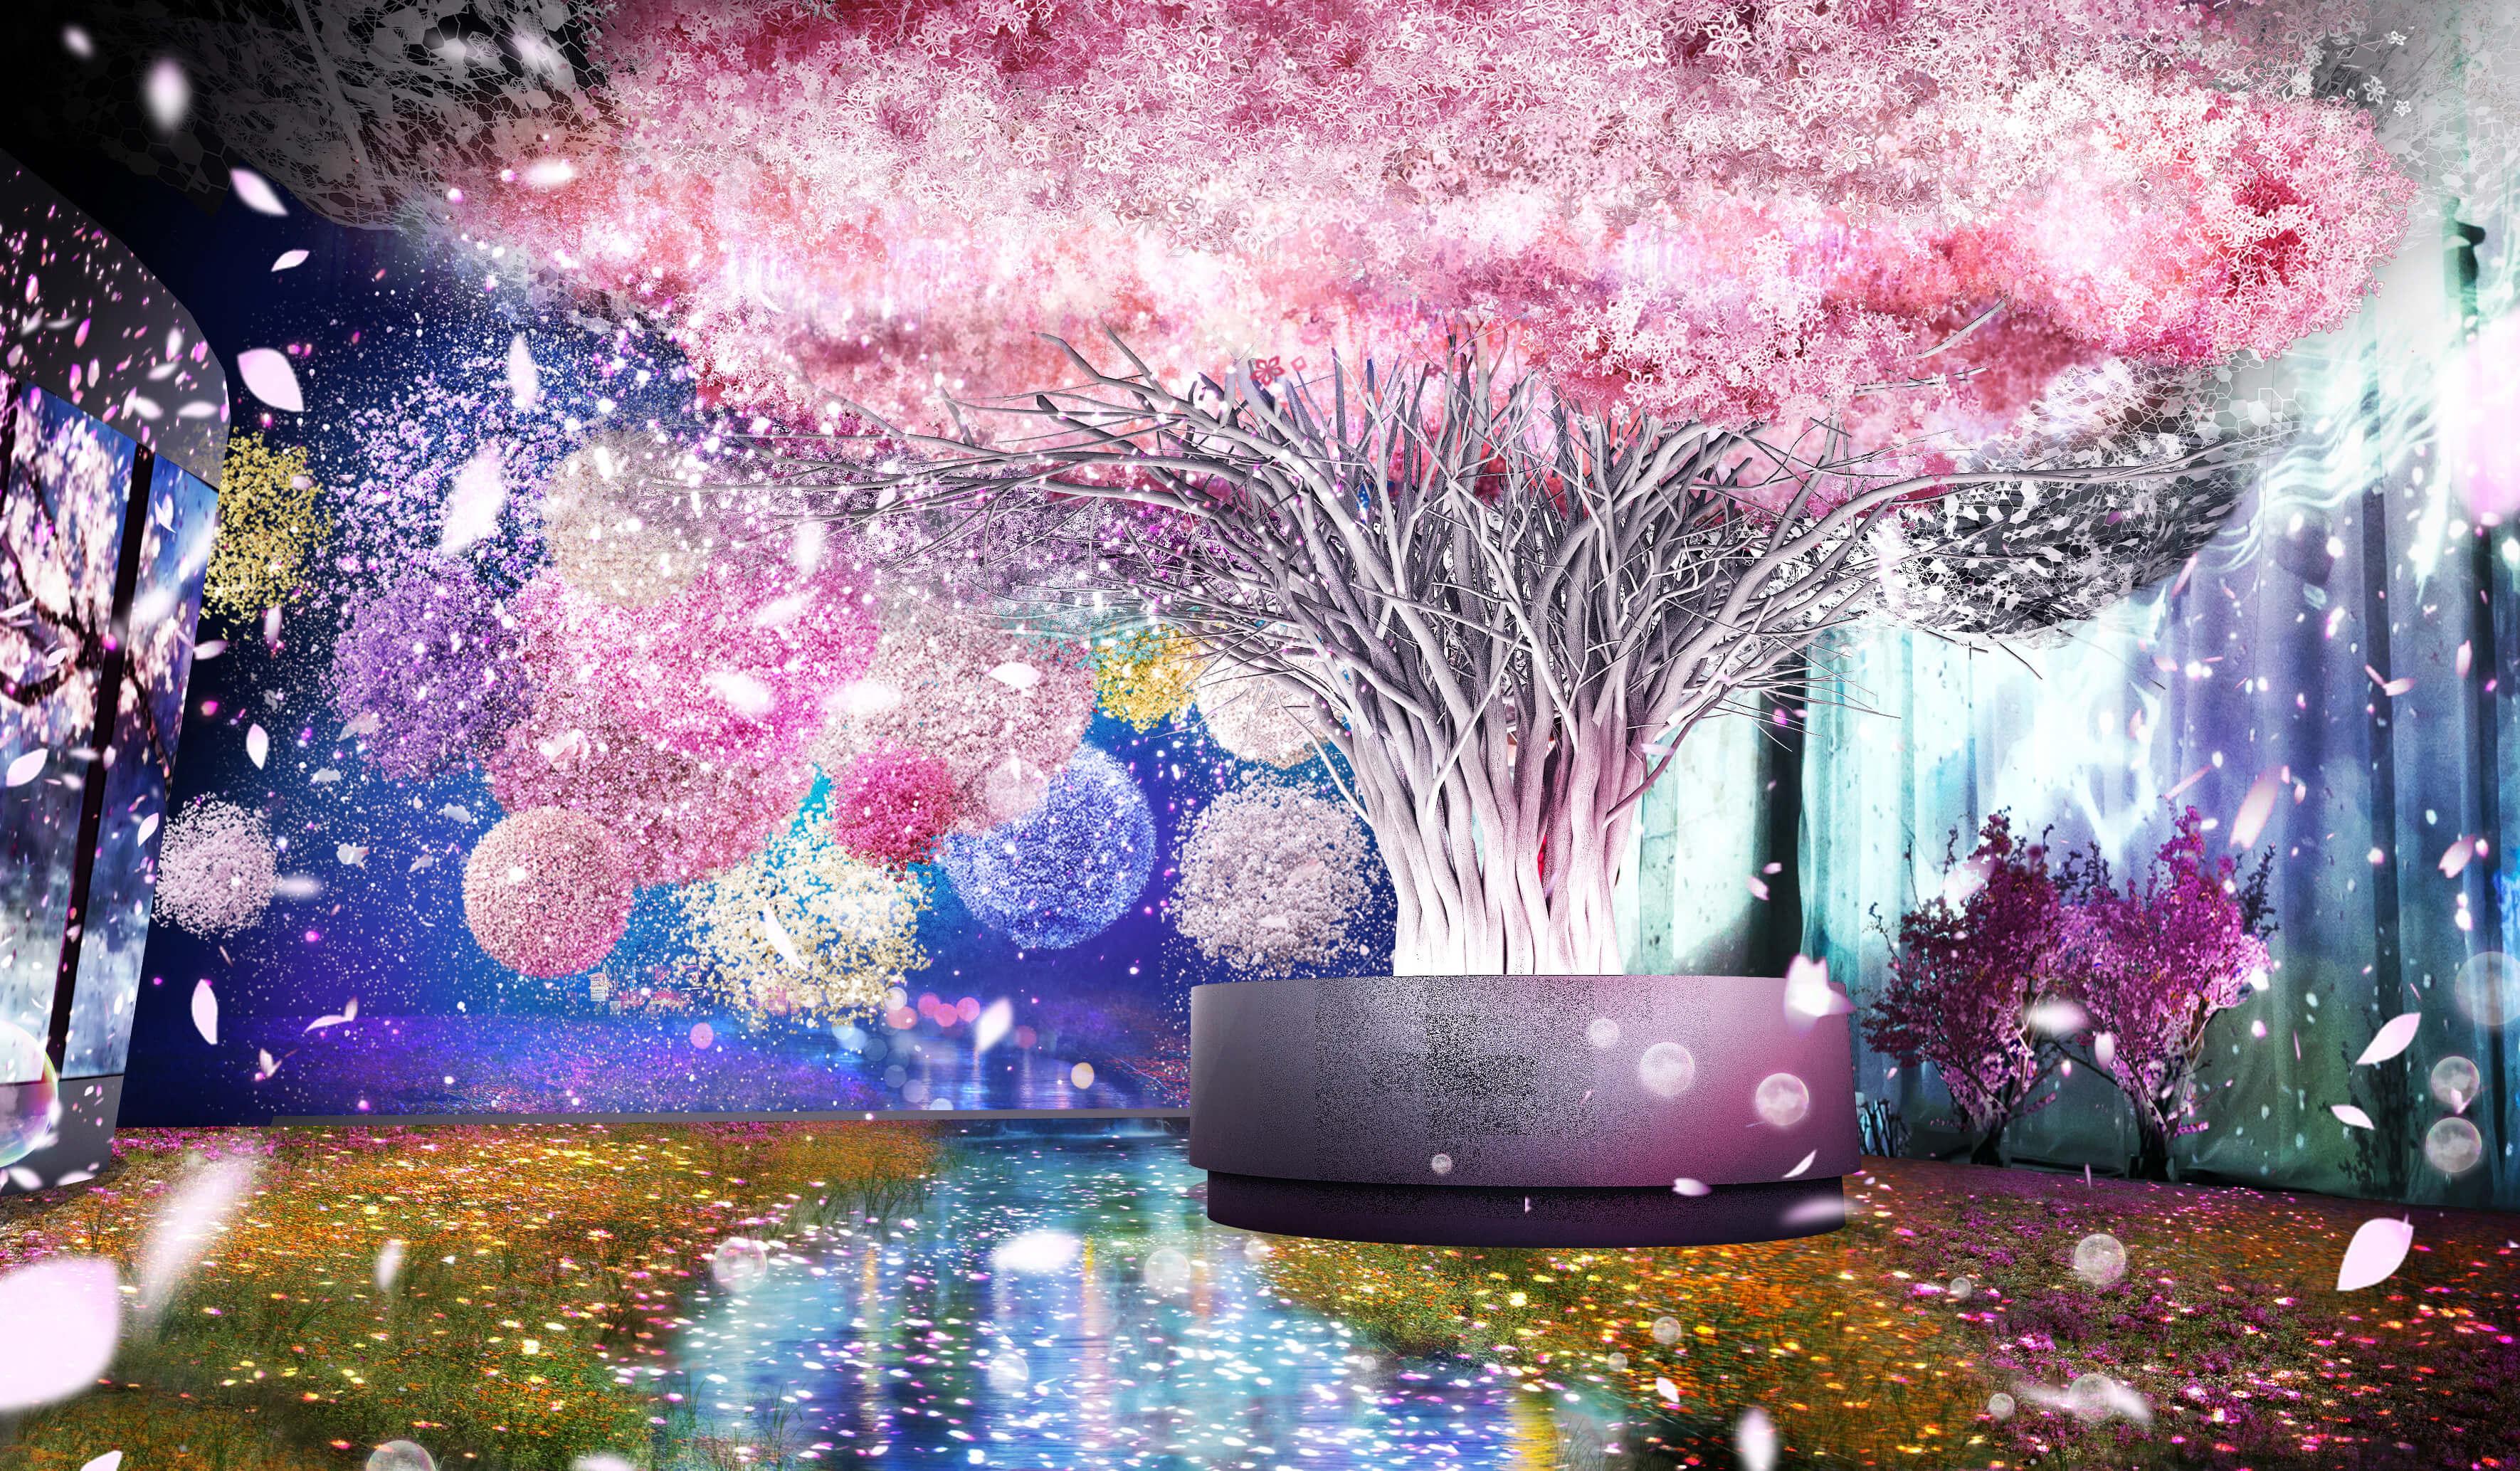 FLOWERS BY NAKED 2020 -桜-(フラワーズ バイ ネイキッド 2020 -サクラ-)5